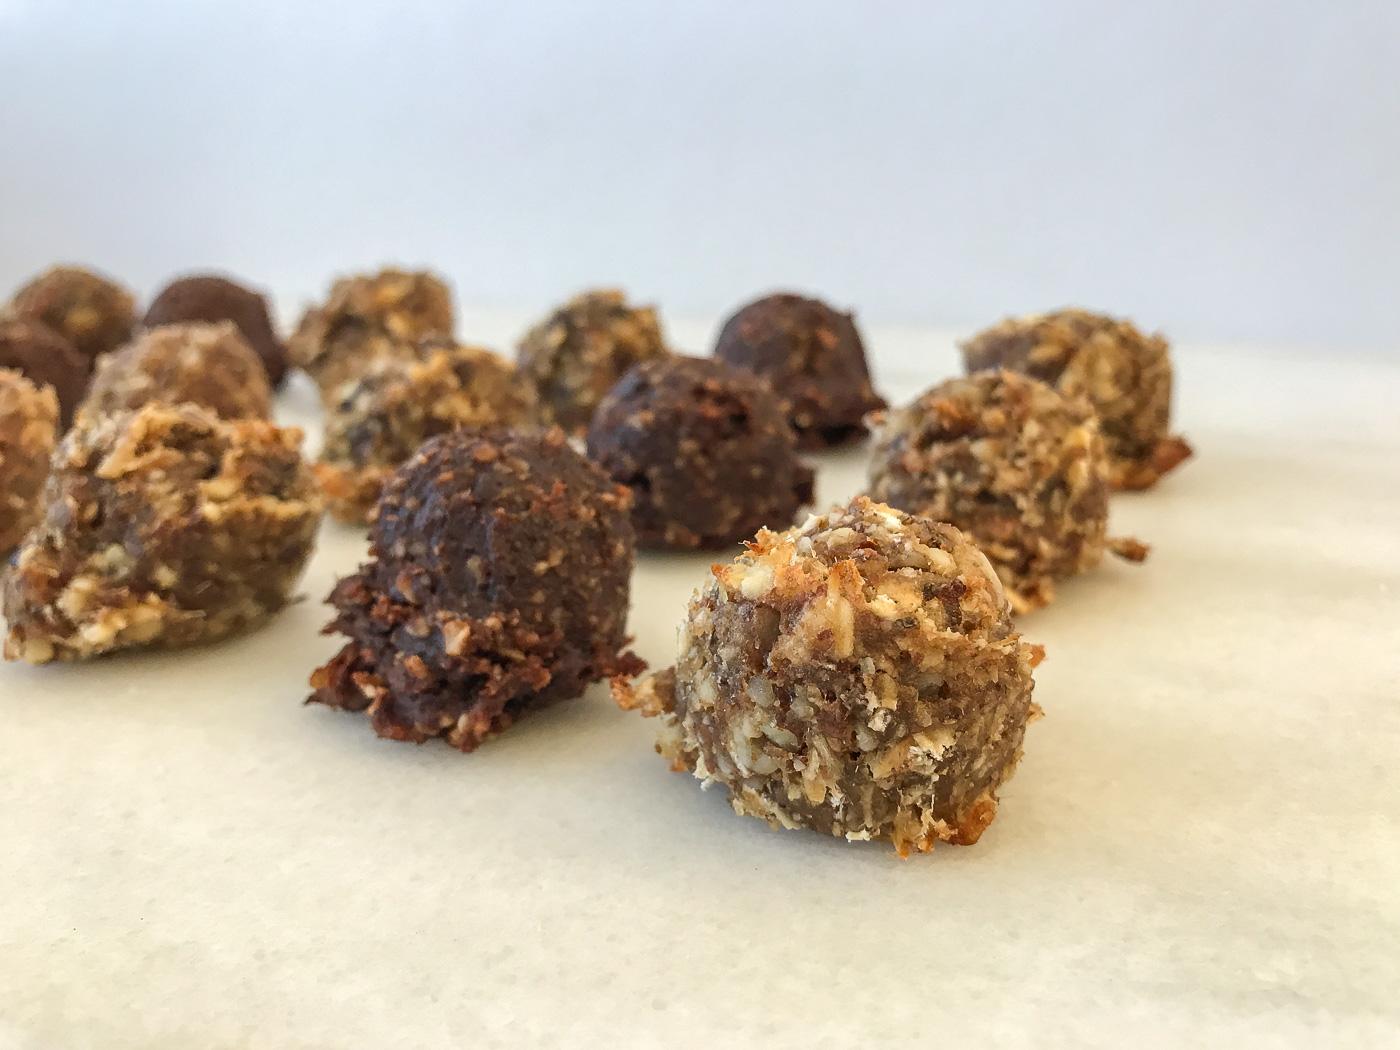 A close up of 9 nutrition bar dough balls